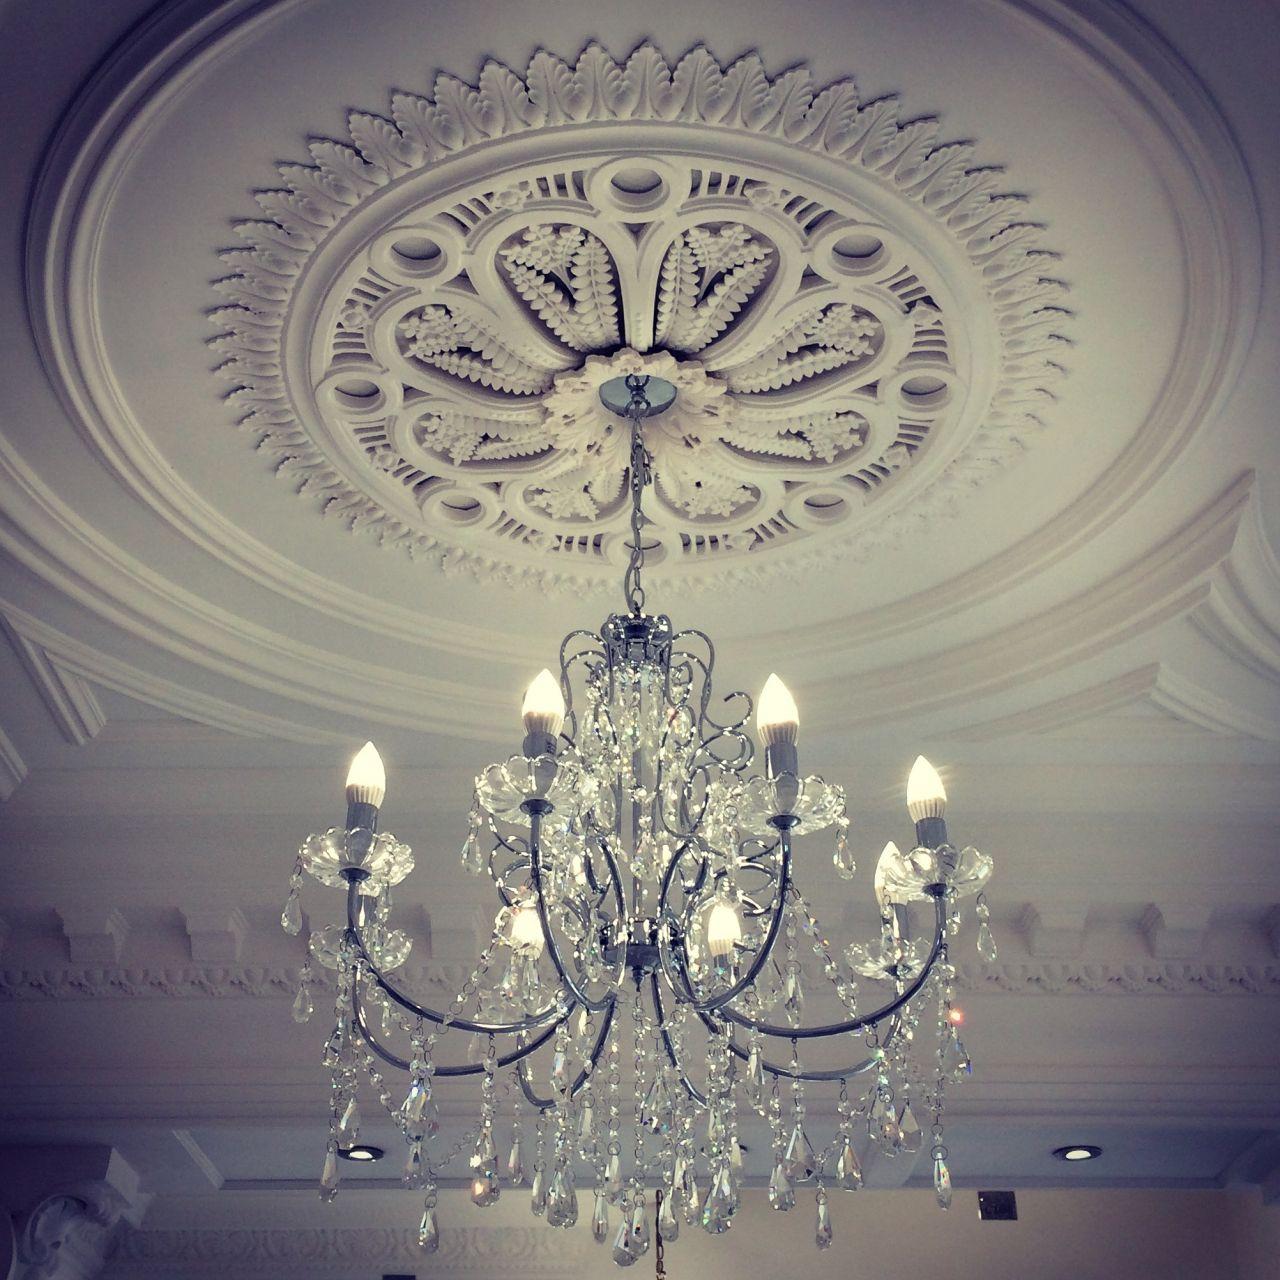 Cornice Plaster Coving Amp Ceiling Roses Polyurethane